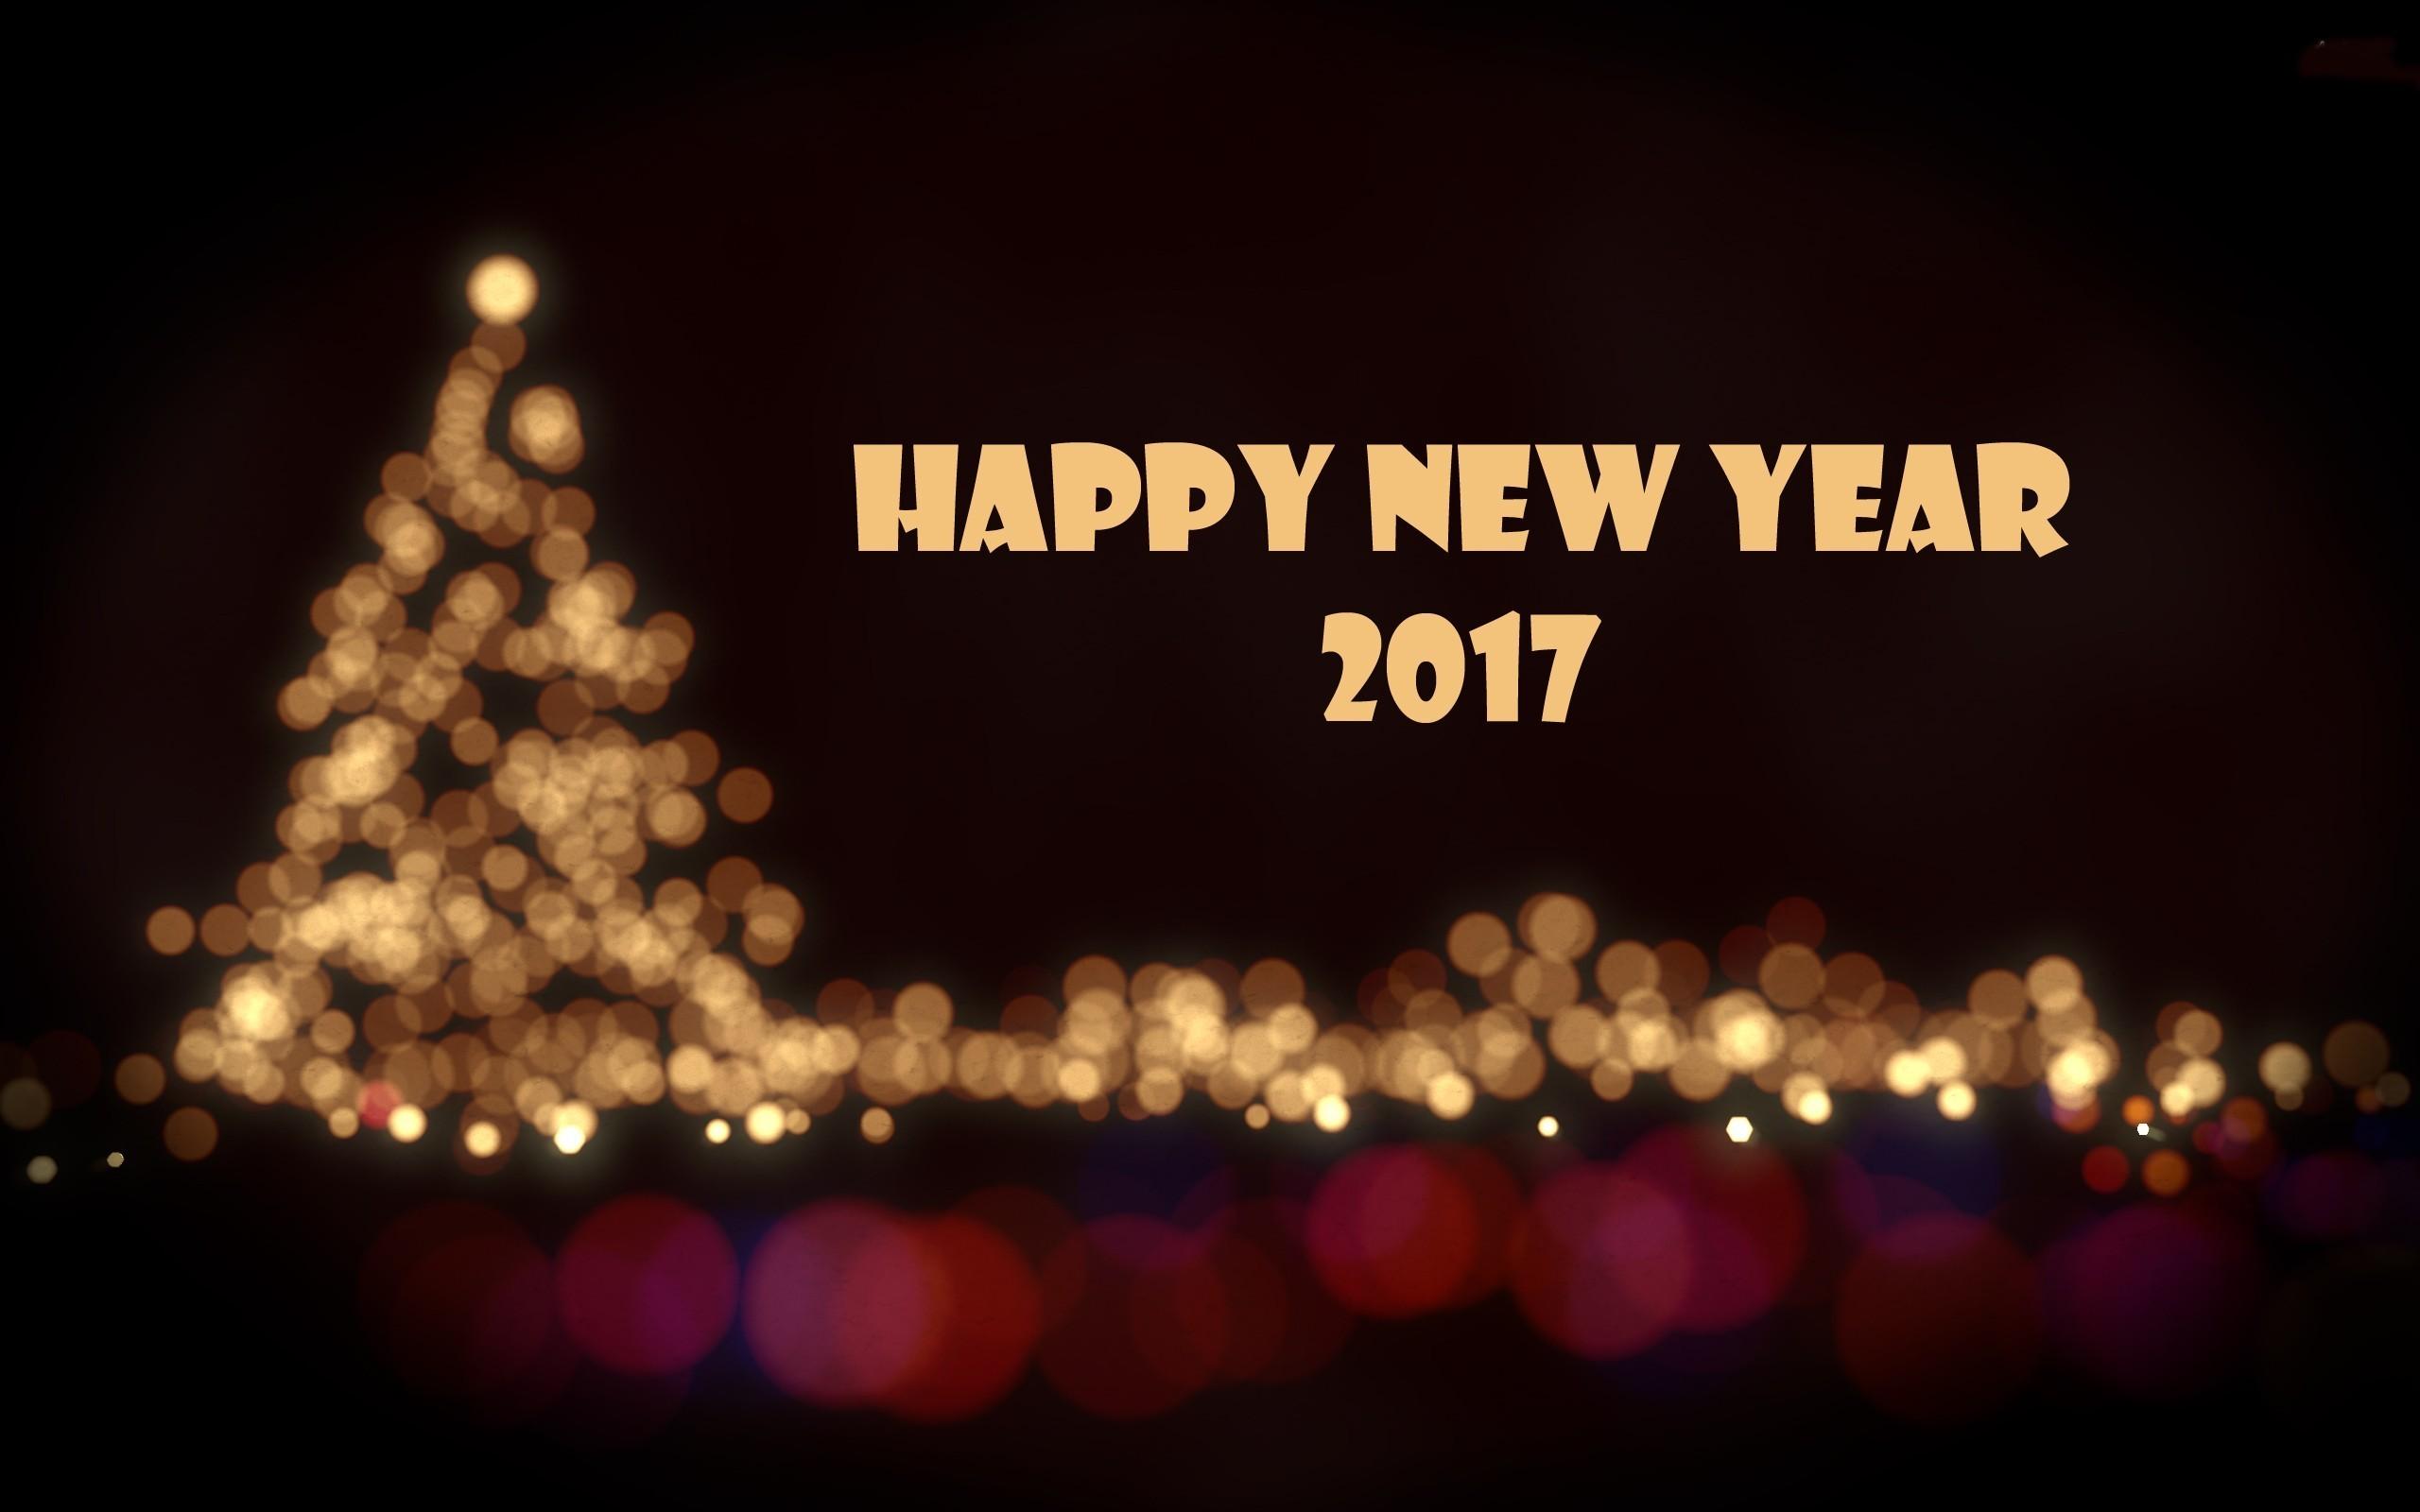 1920x1200 top happy new year 2017 screensaver image wallpaper happy new year 2017 pinterest screensaver and wallpaper